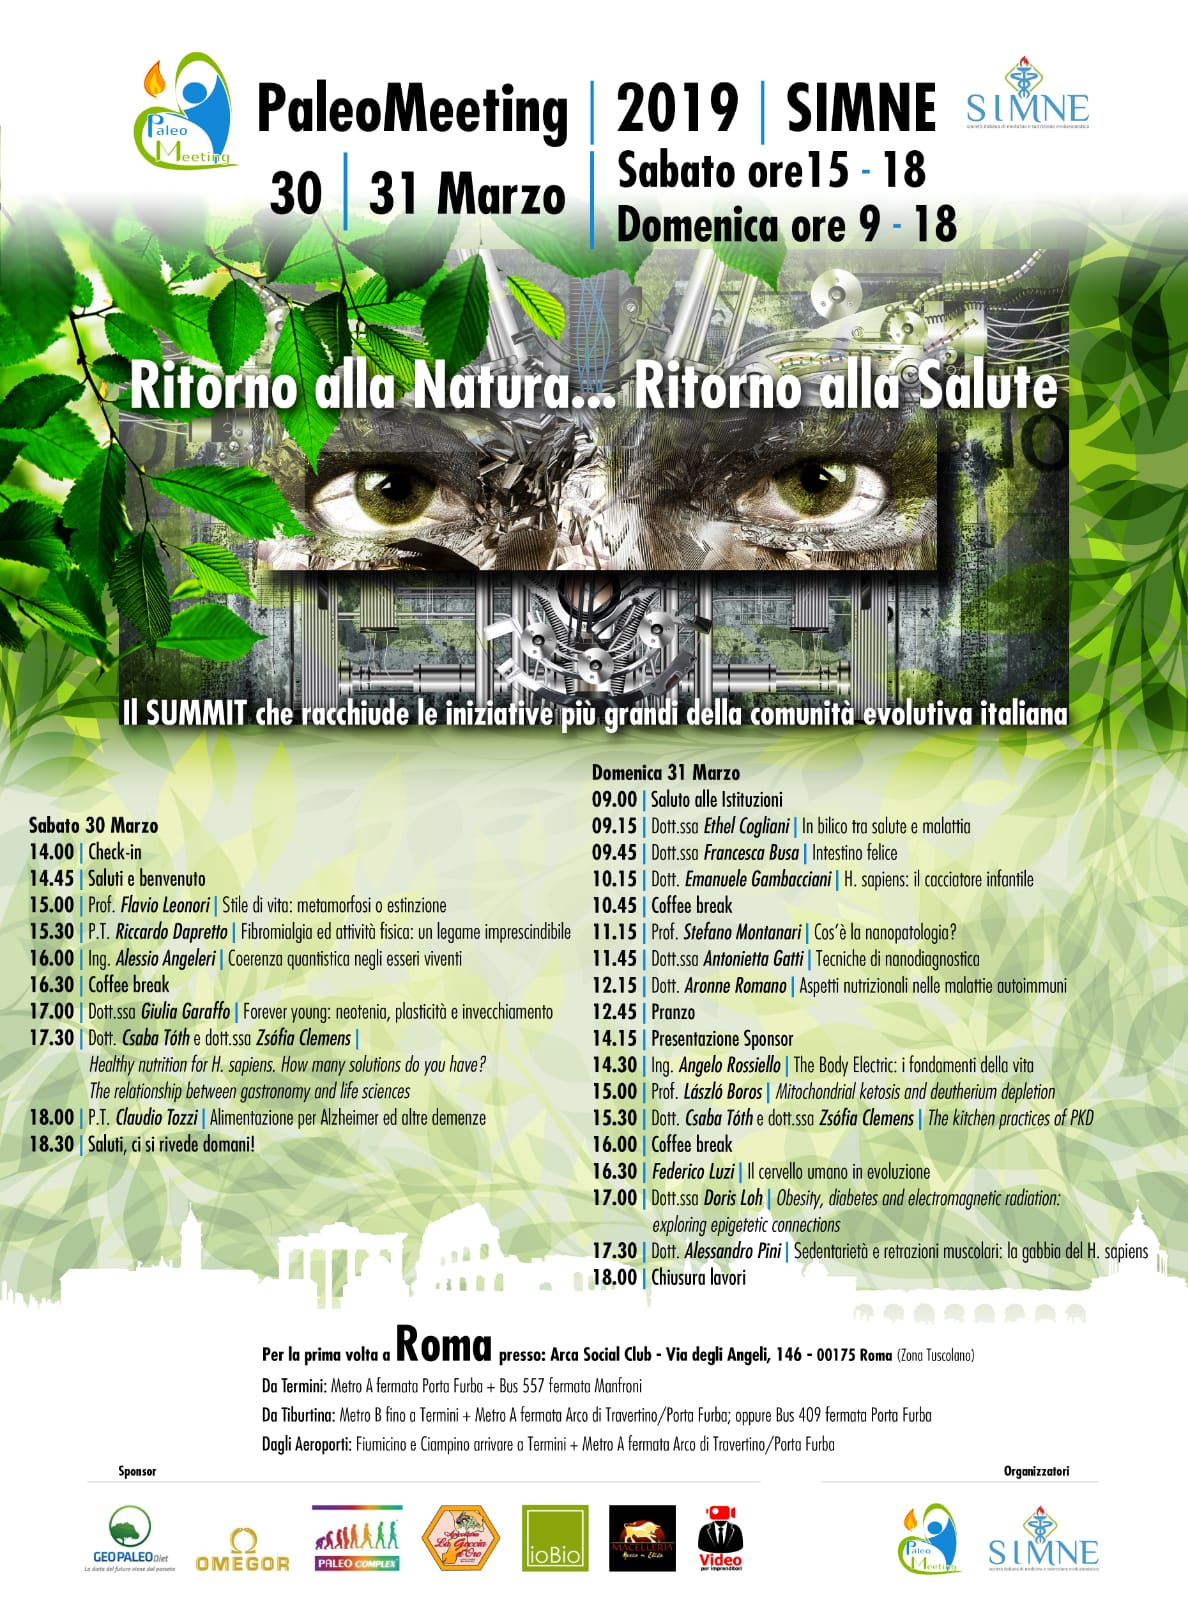 Locandina PaleoMeeting + SIMNE con Programma